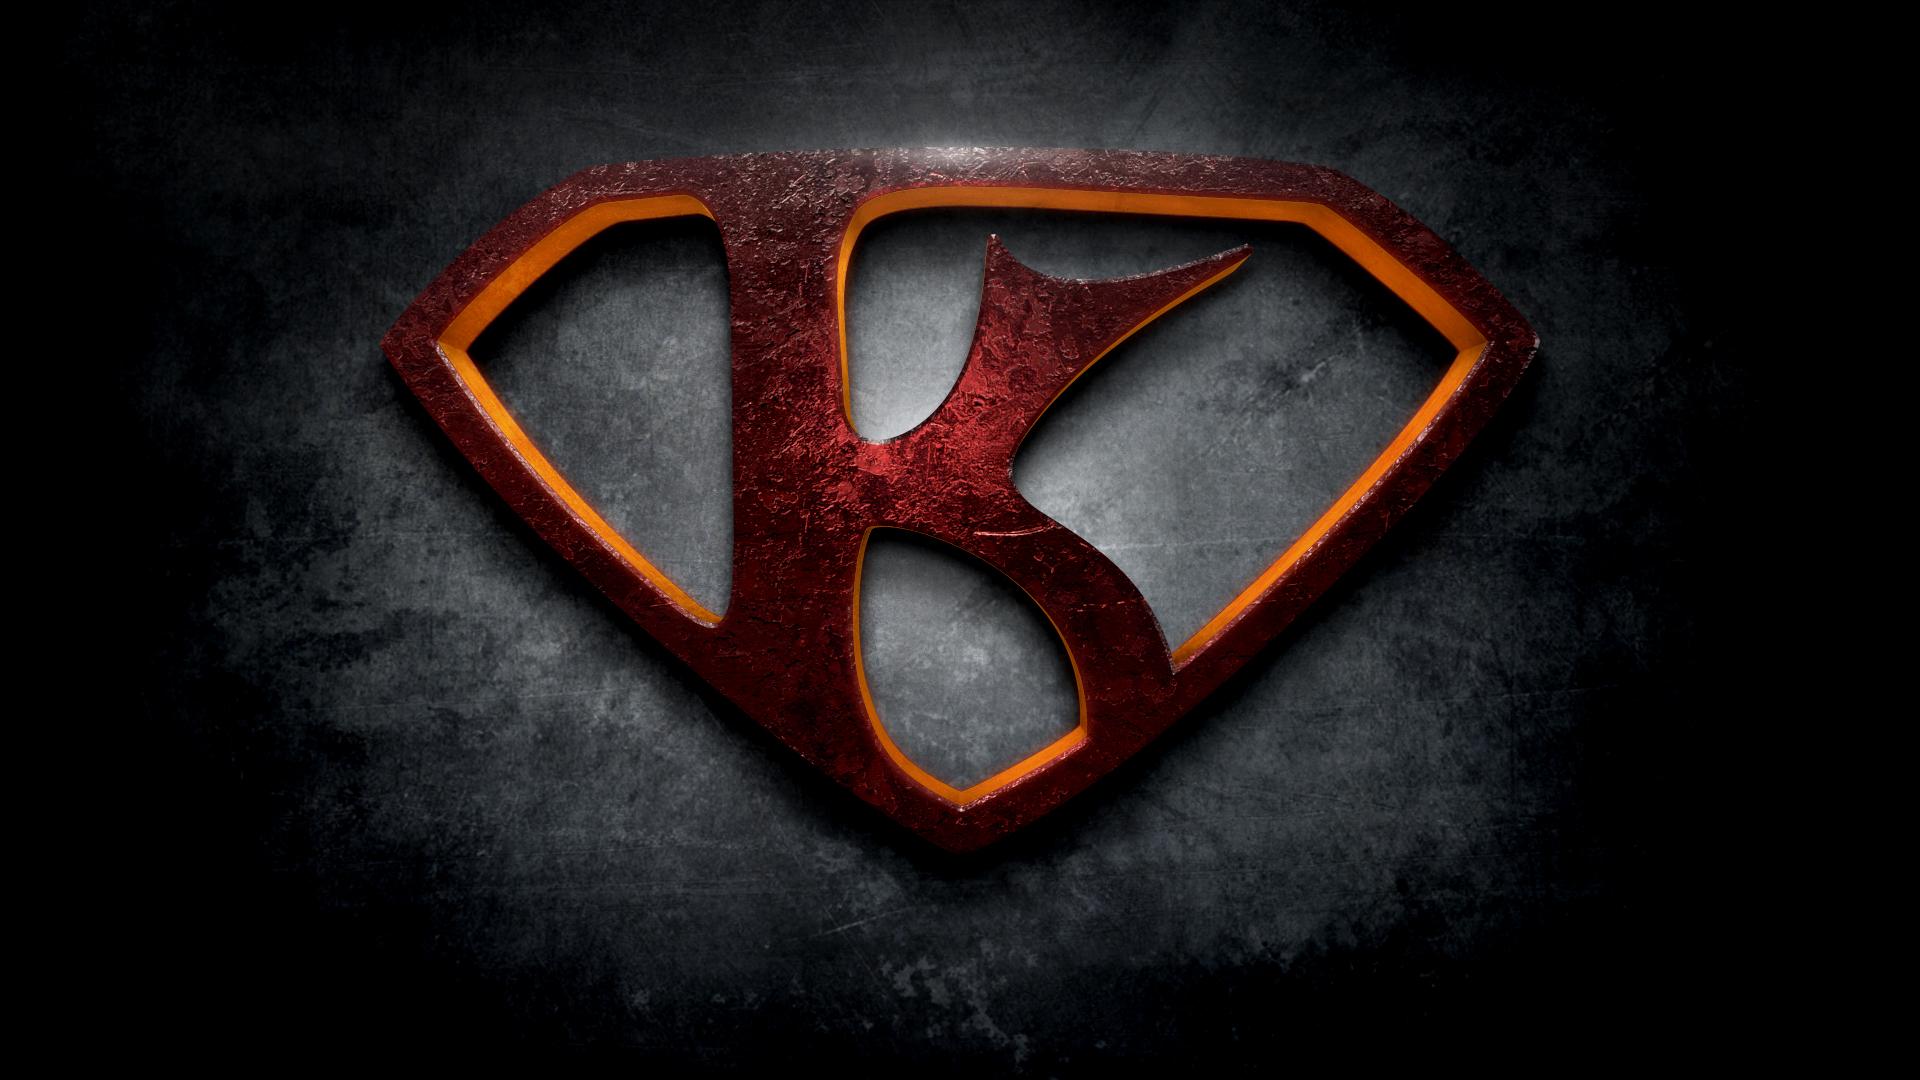 M Letter Logo Wallpaper Hd Initial K Wallp...